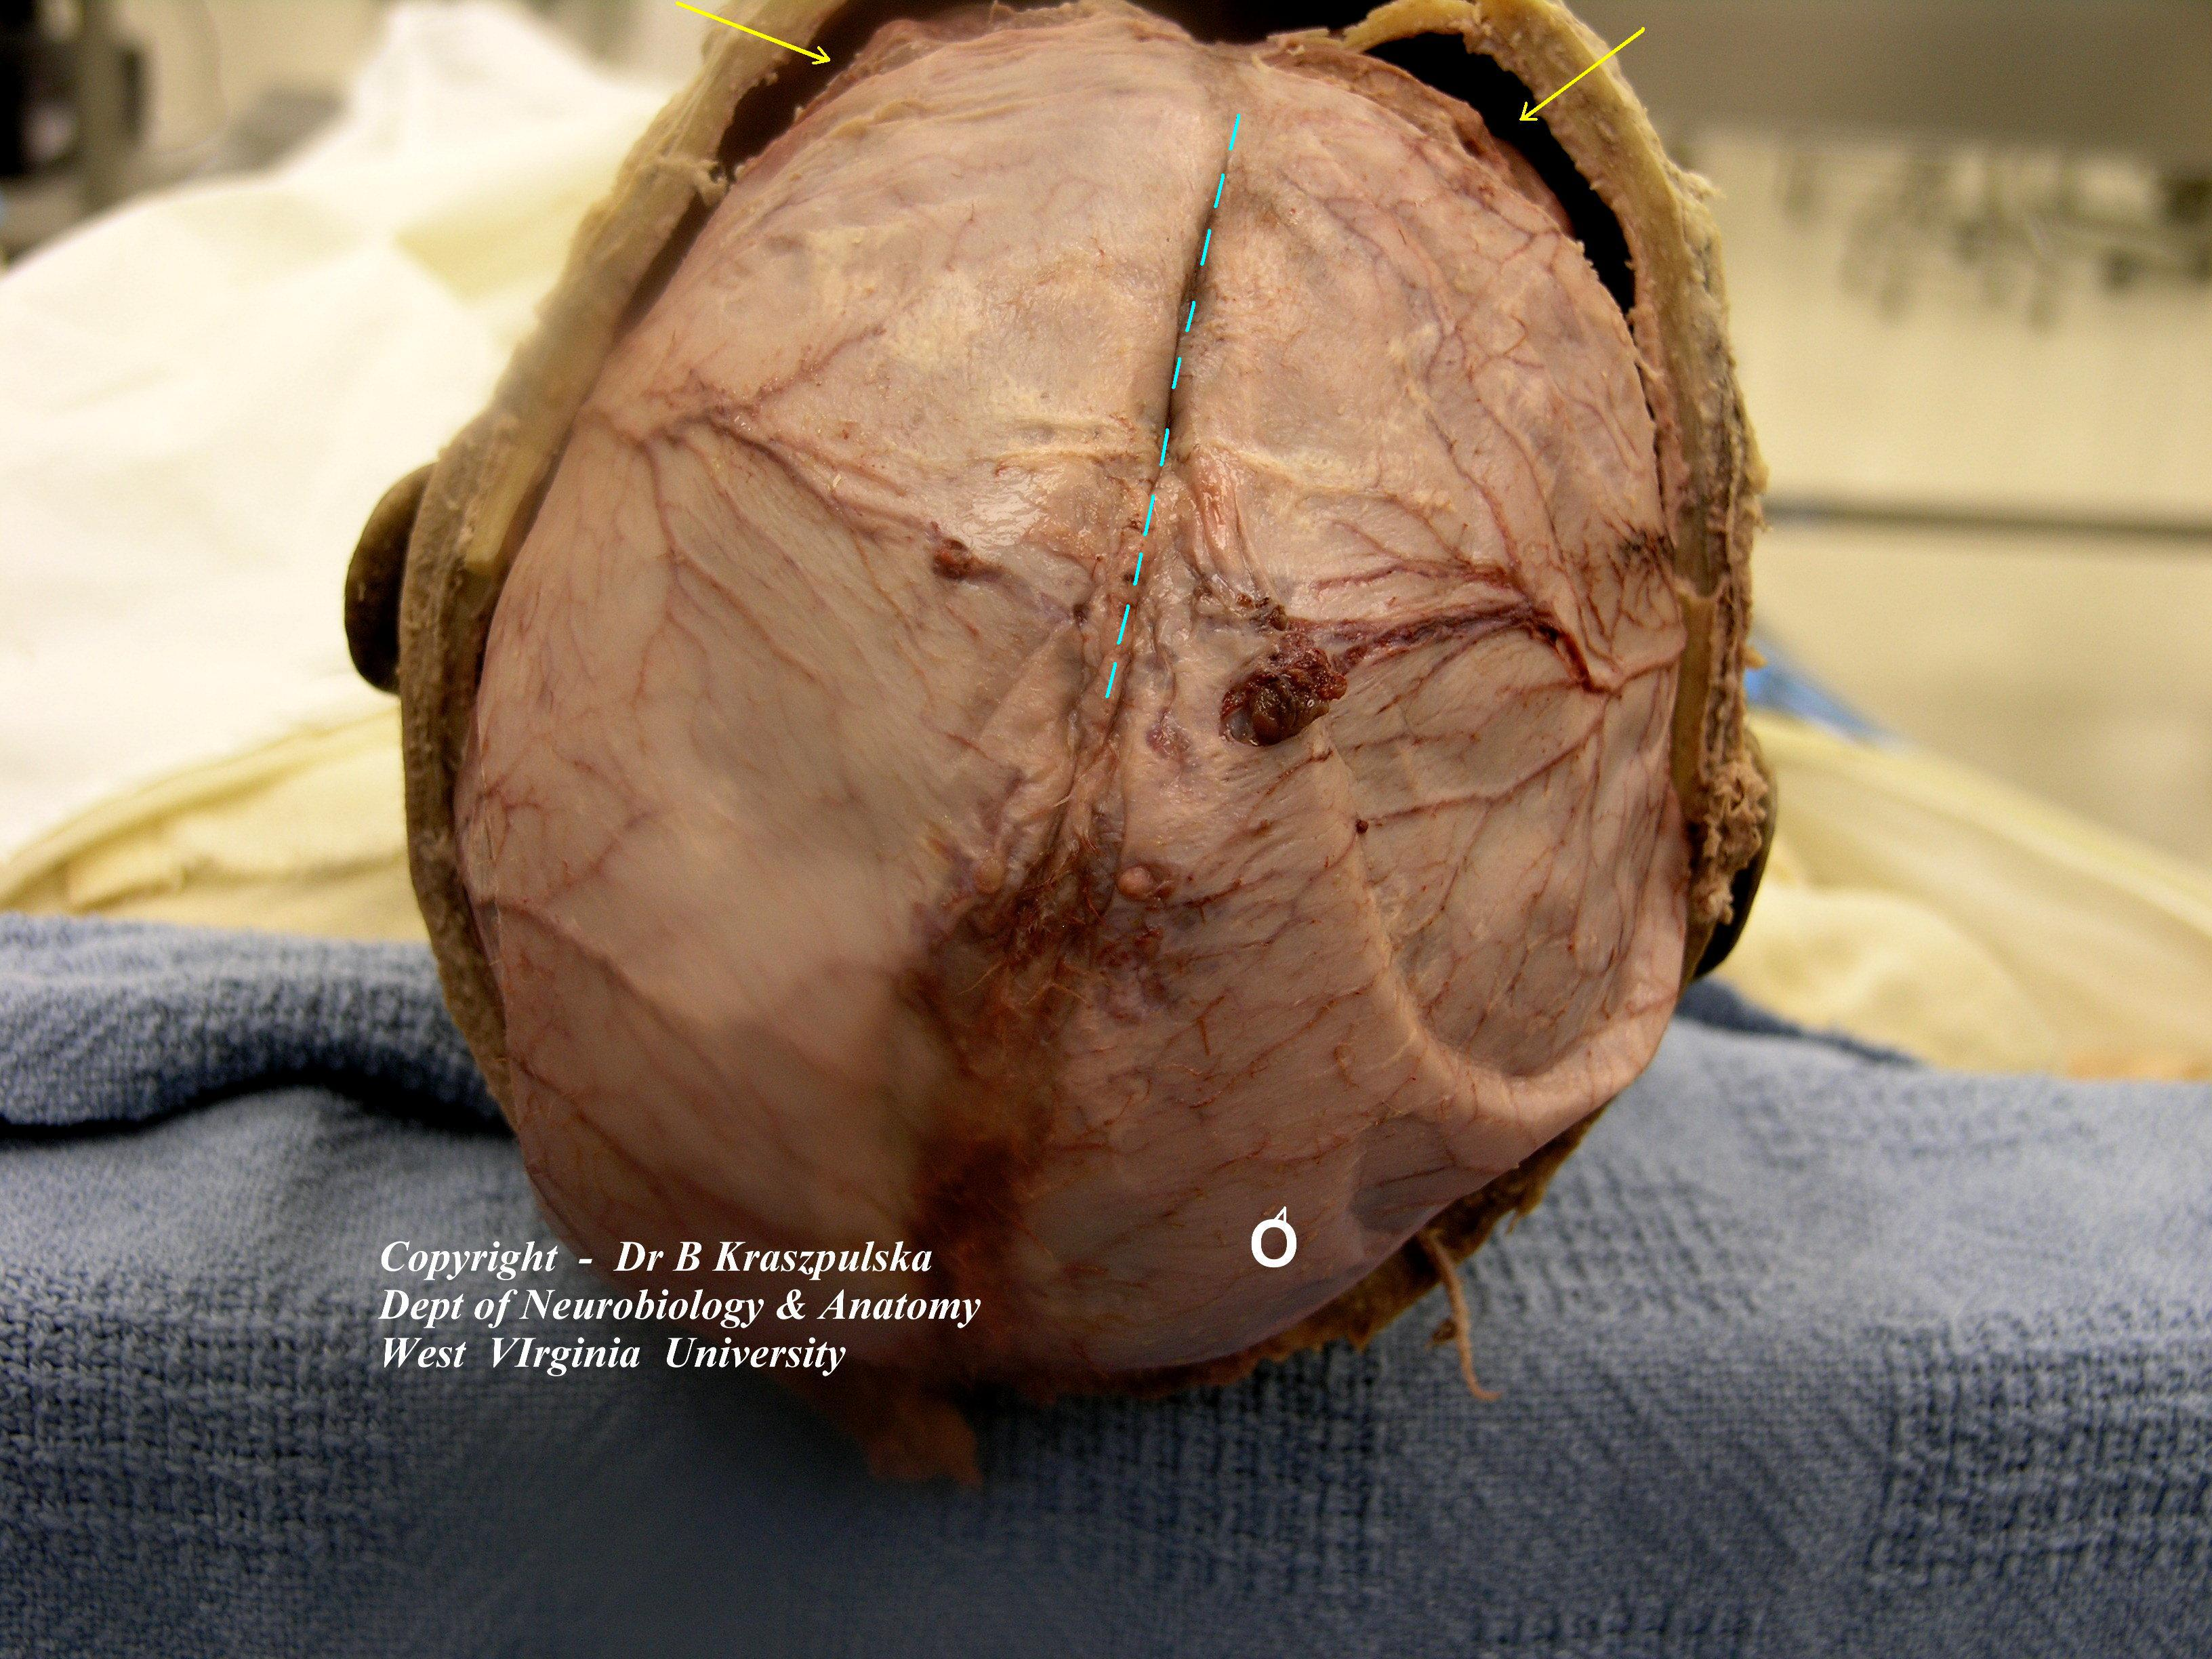 Brains Skull Skull Open Brain in Situ